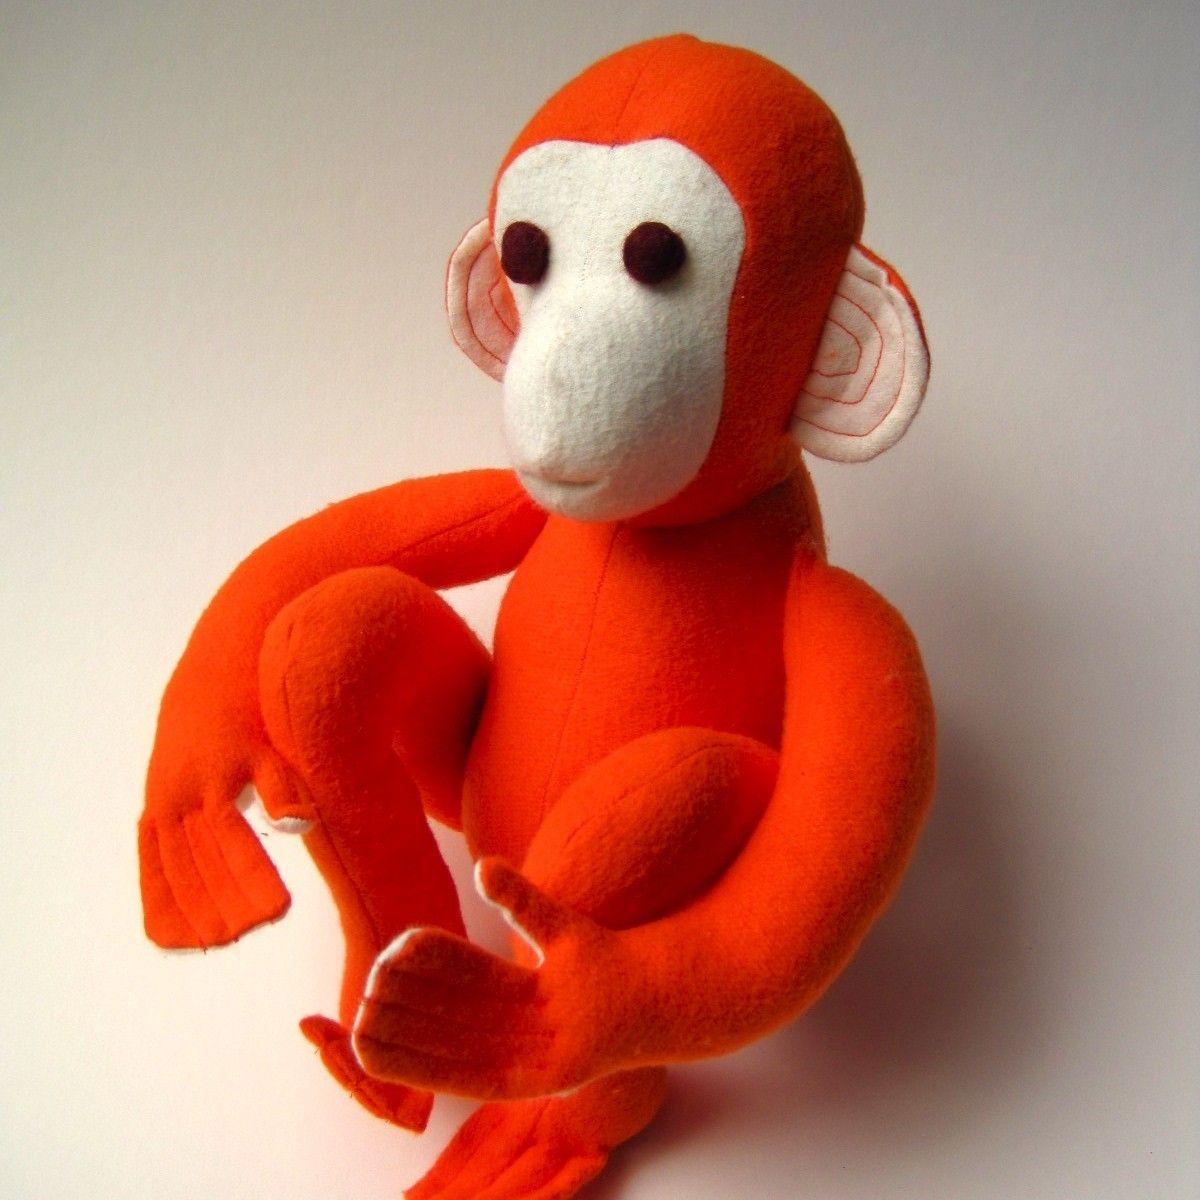 Organic Monkey TOY Stuffed Animal Baby and Toddler Eco